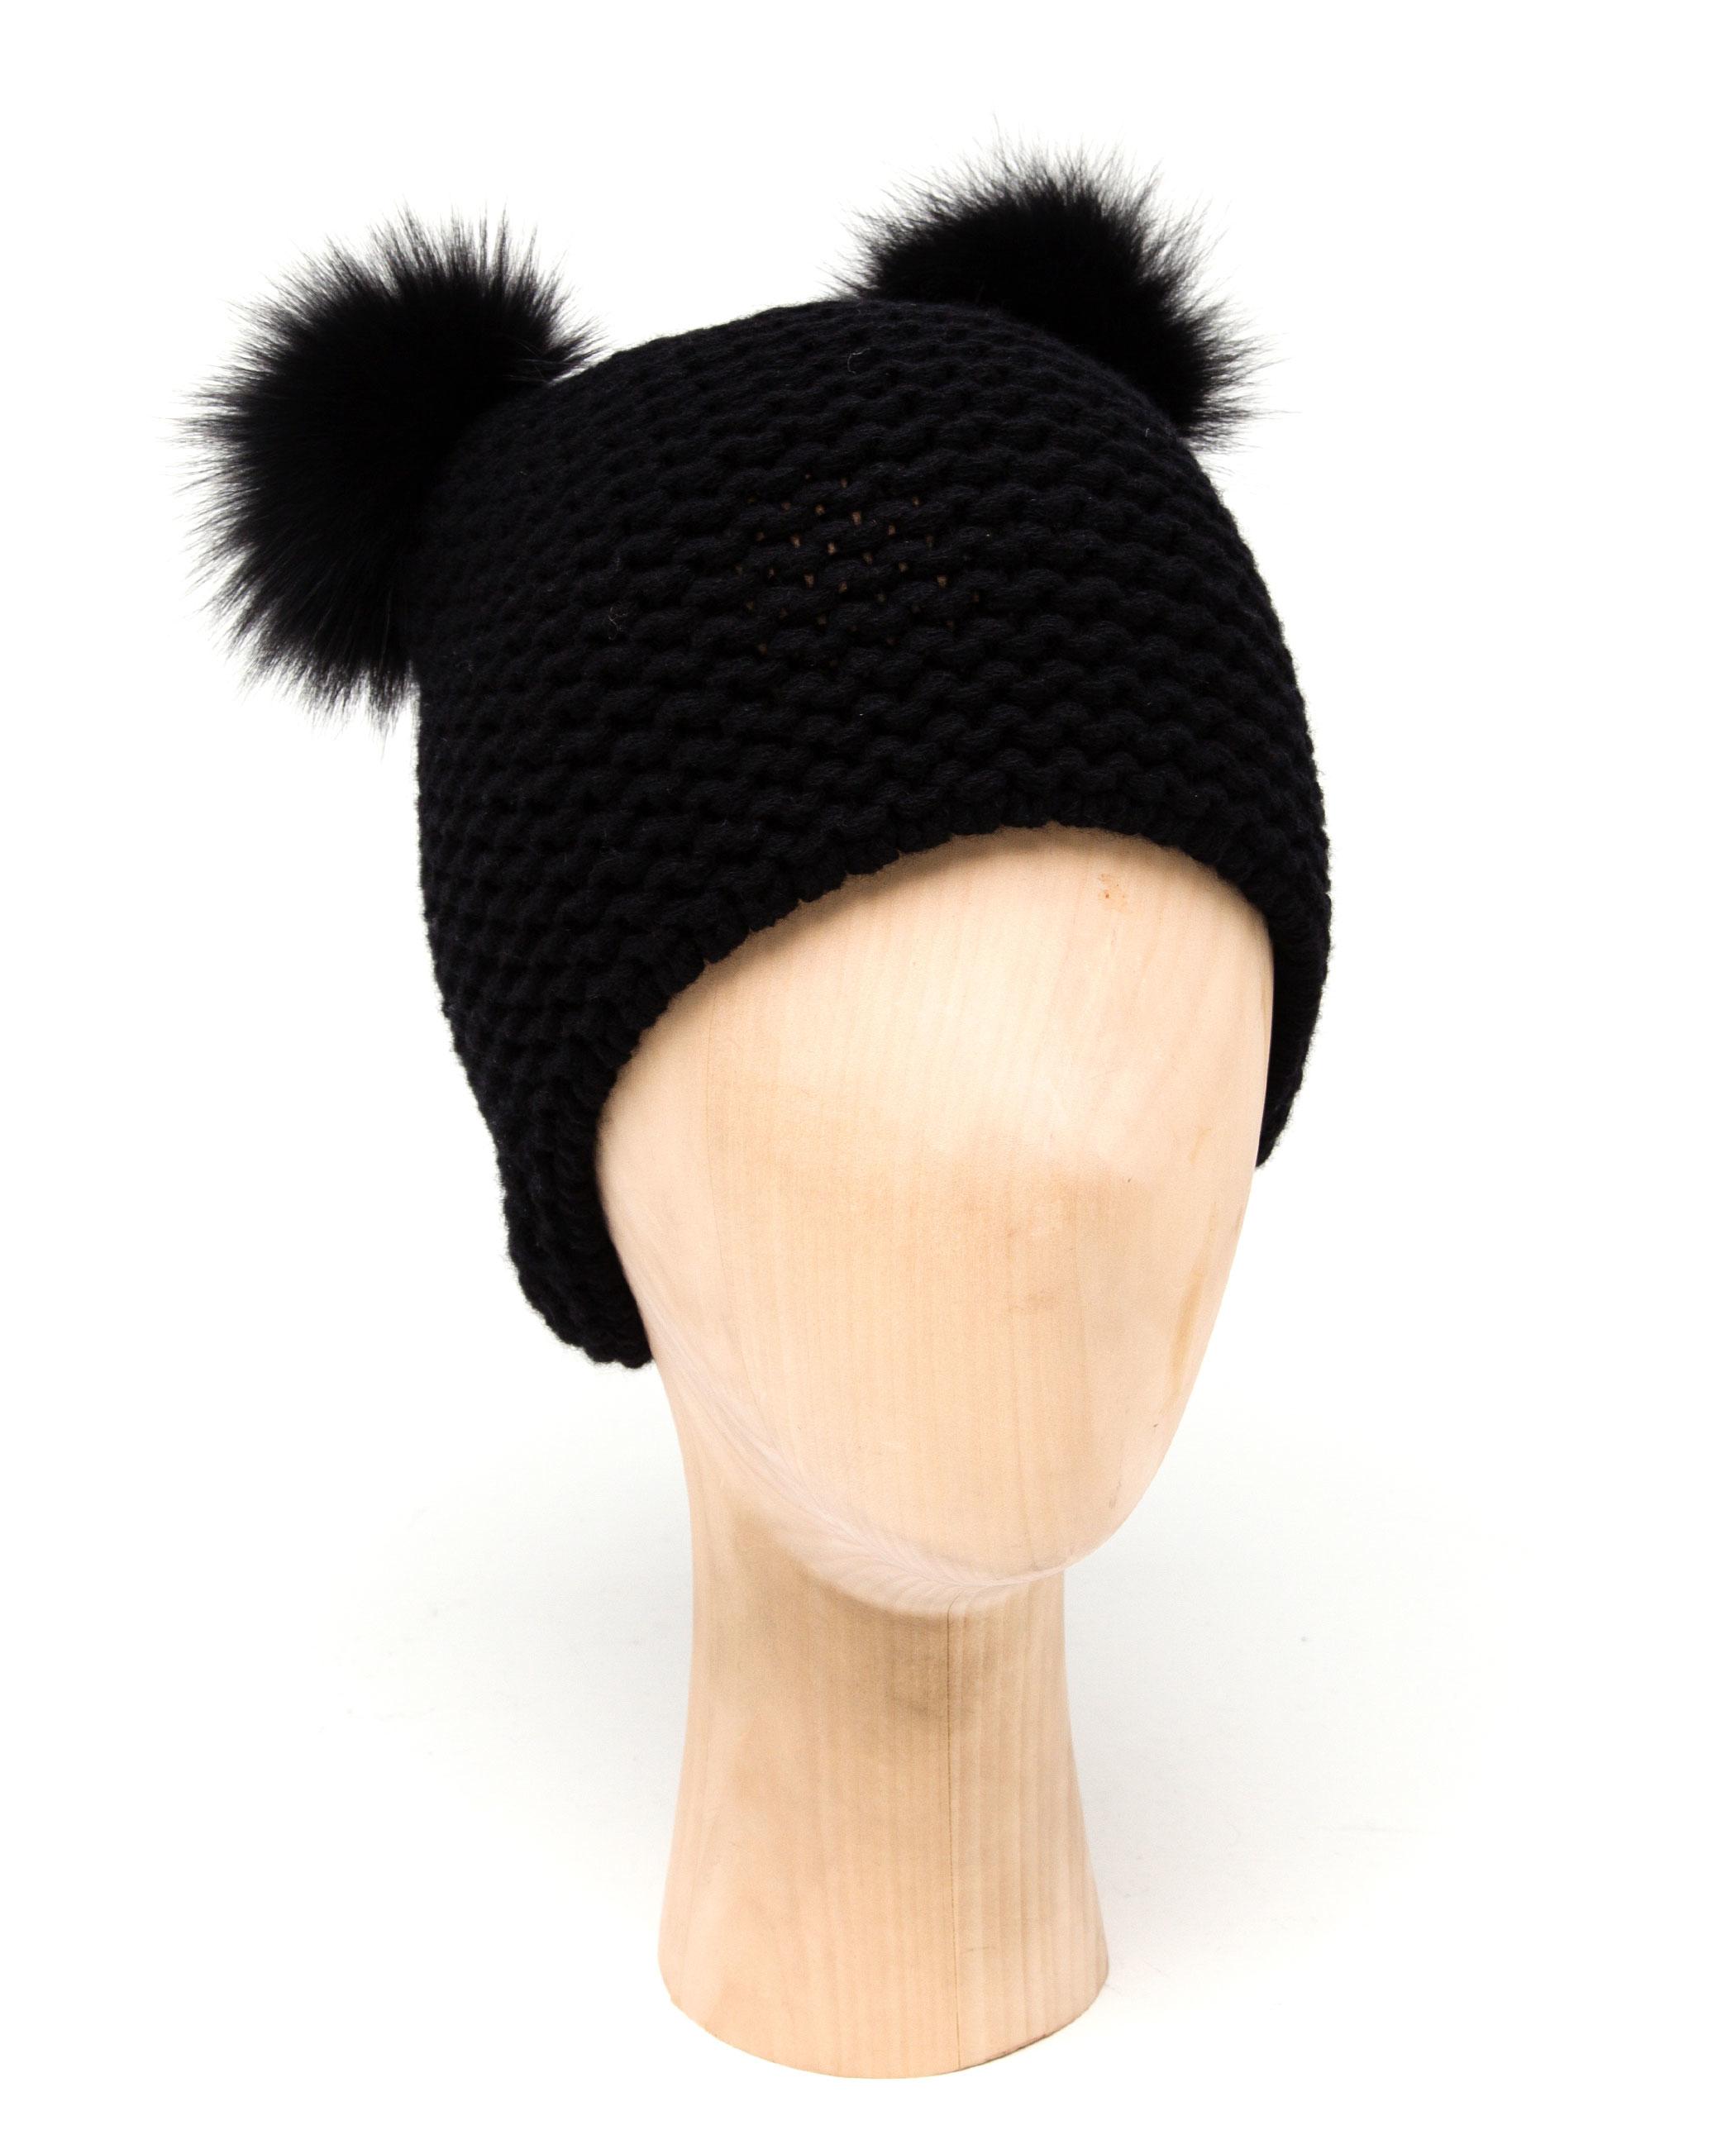 Lyst - Inverni Cashmere Hat With Fox Fur Pom Poms in Black